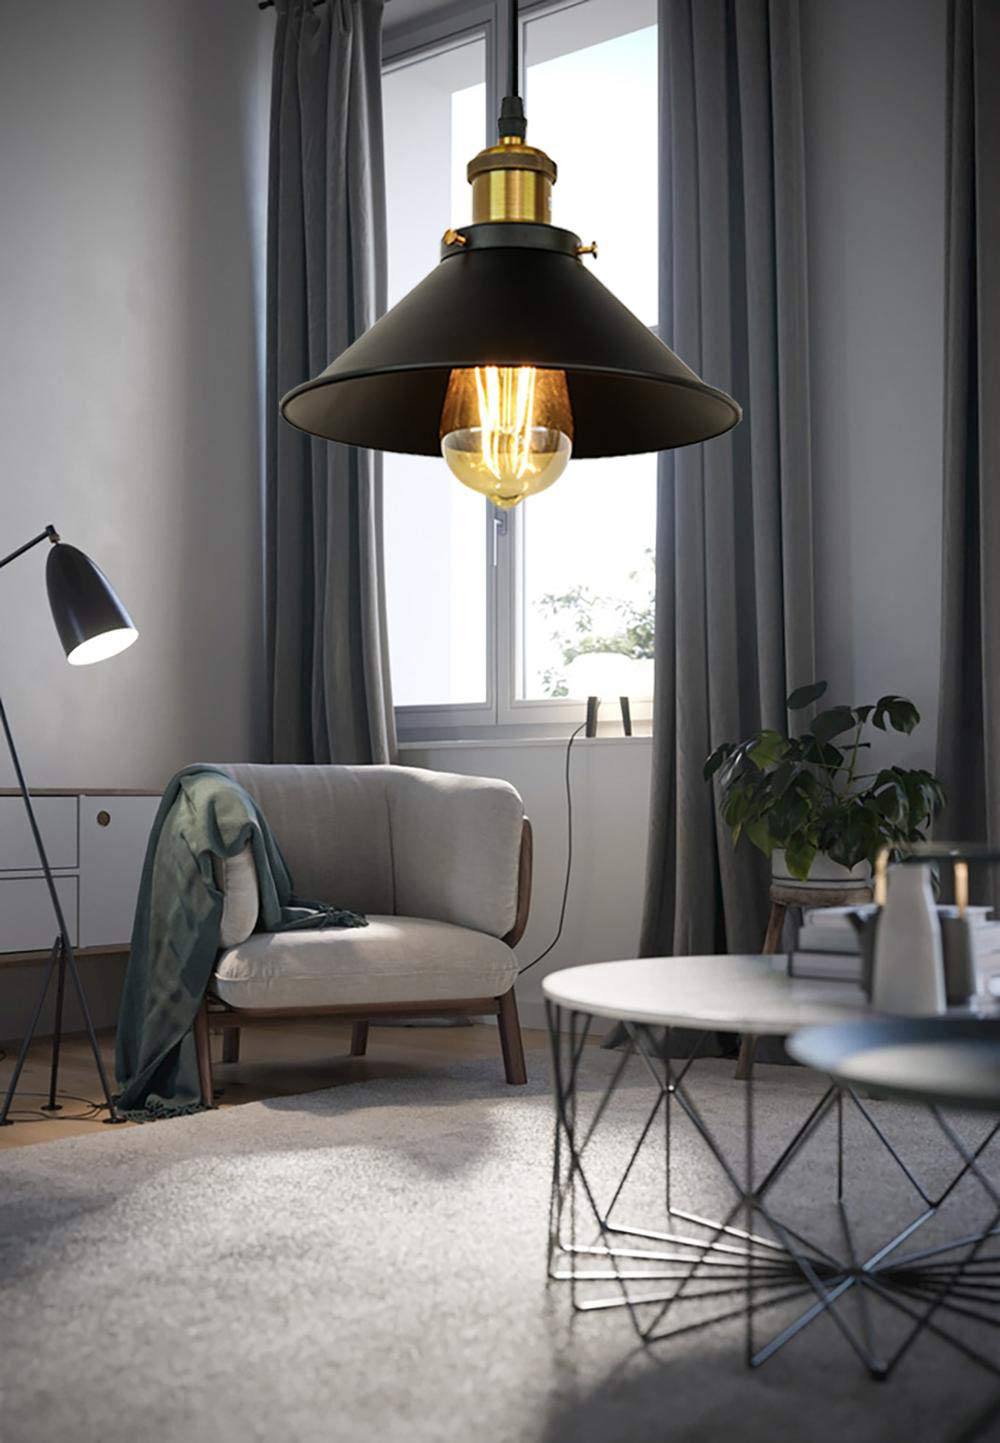 Vintage Luces Colgantes, Loft Rusia Lámpara Colgante Hanging Lámpara ...